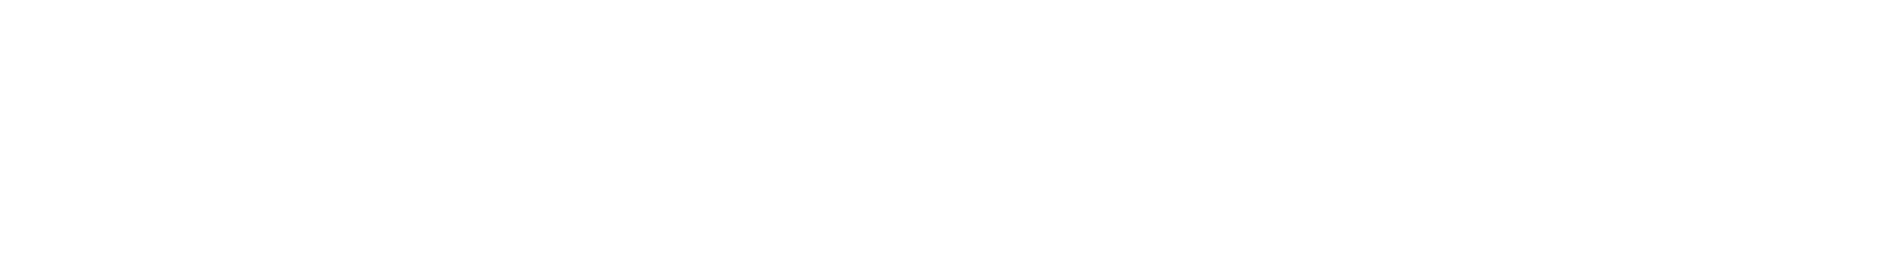 Merlomedia agencia digital